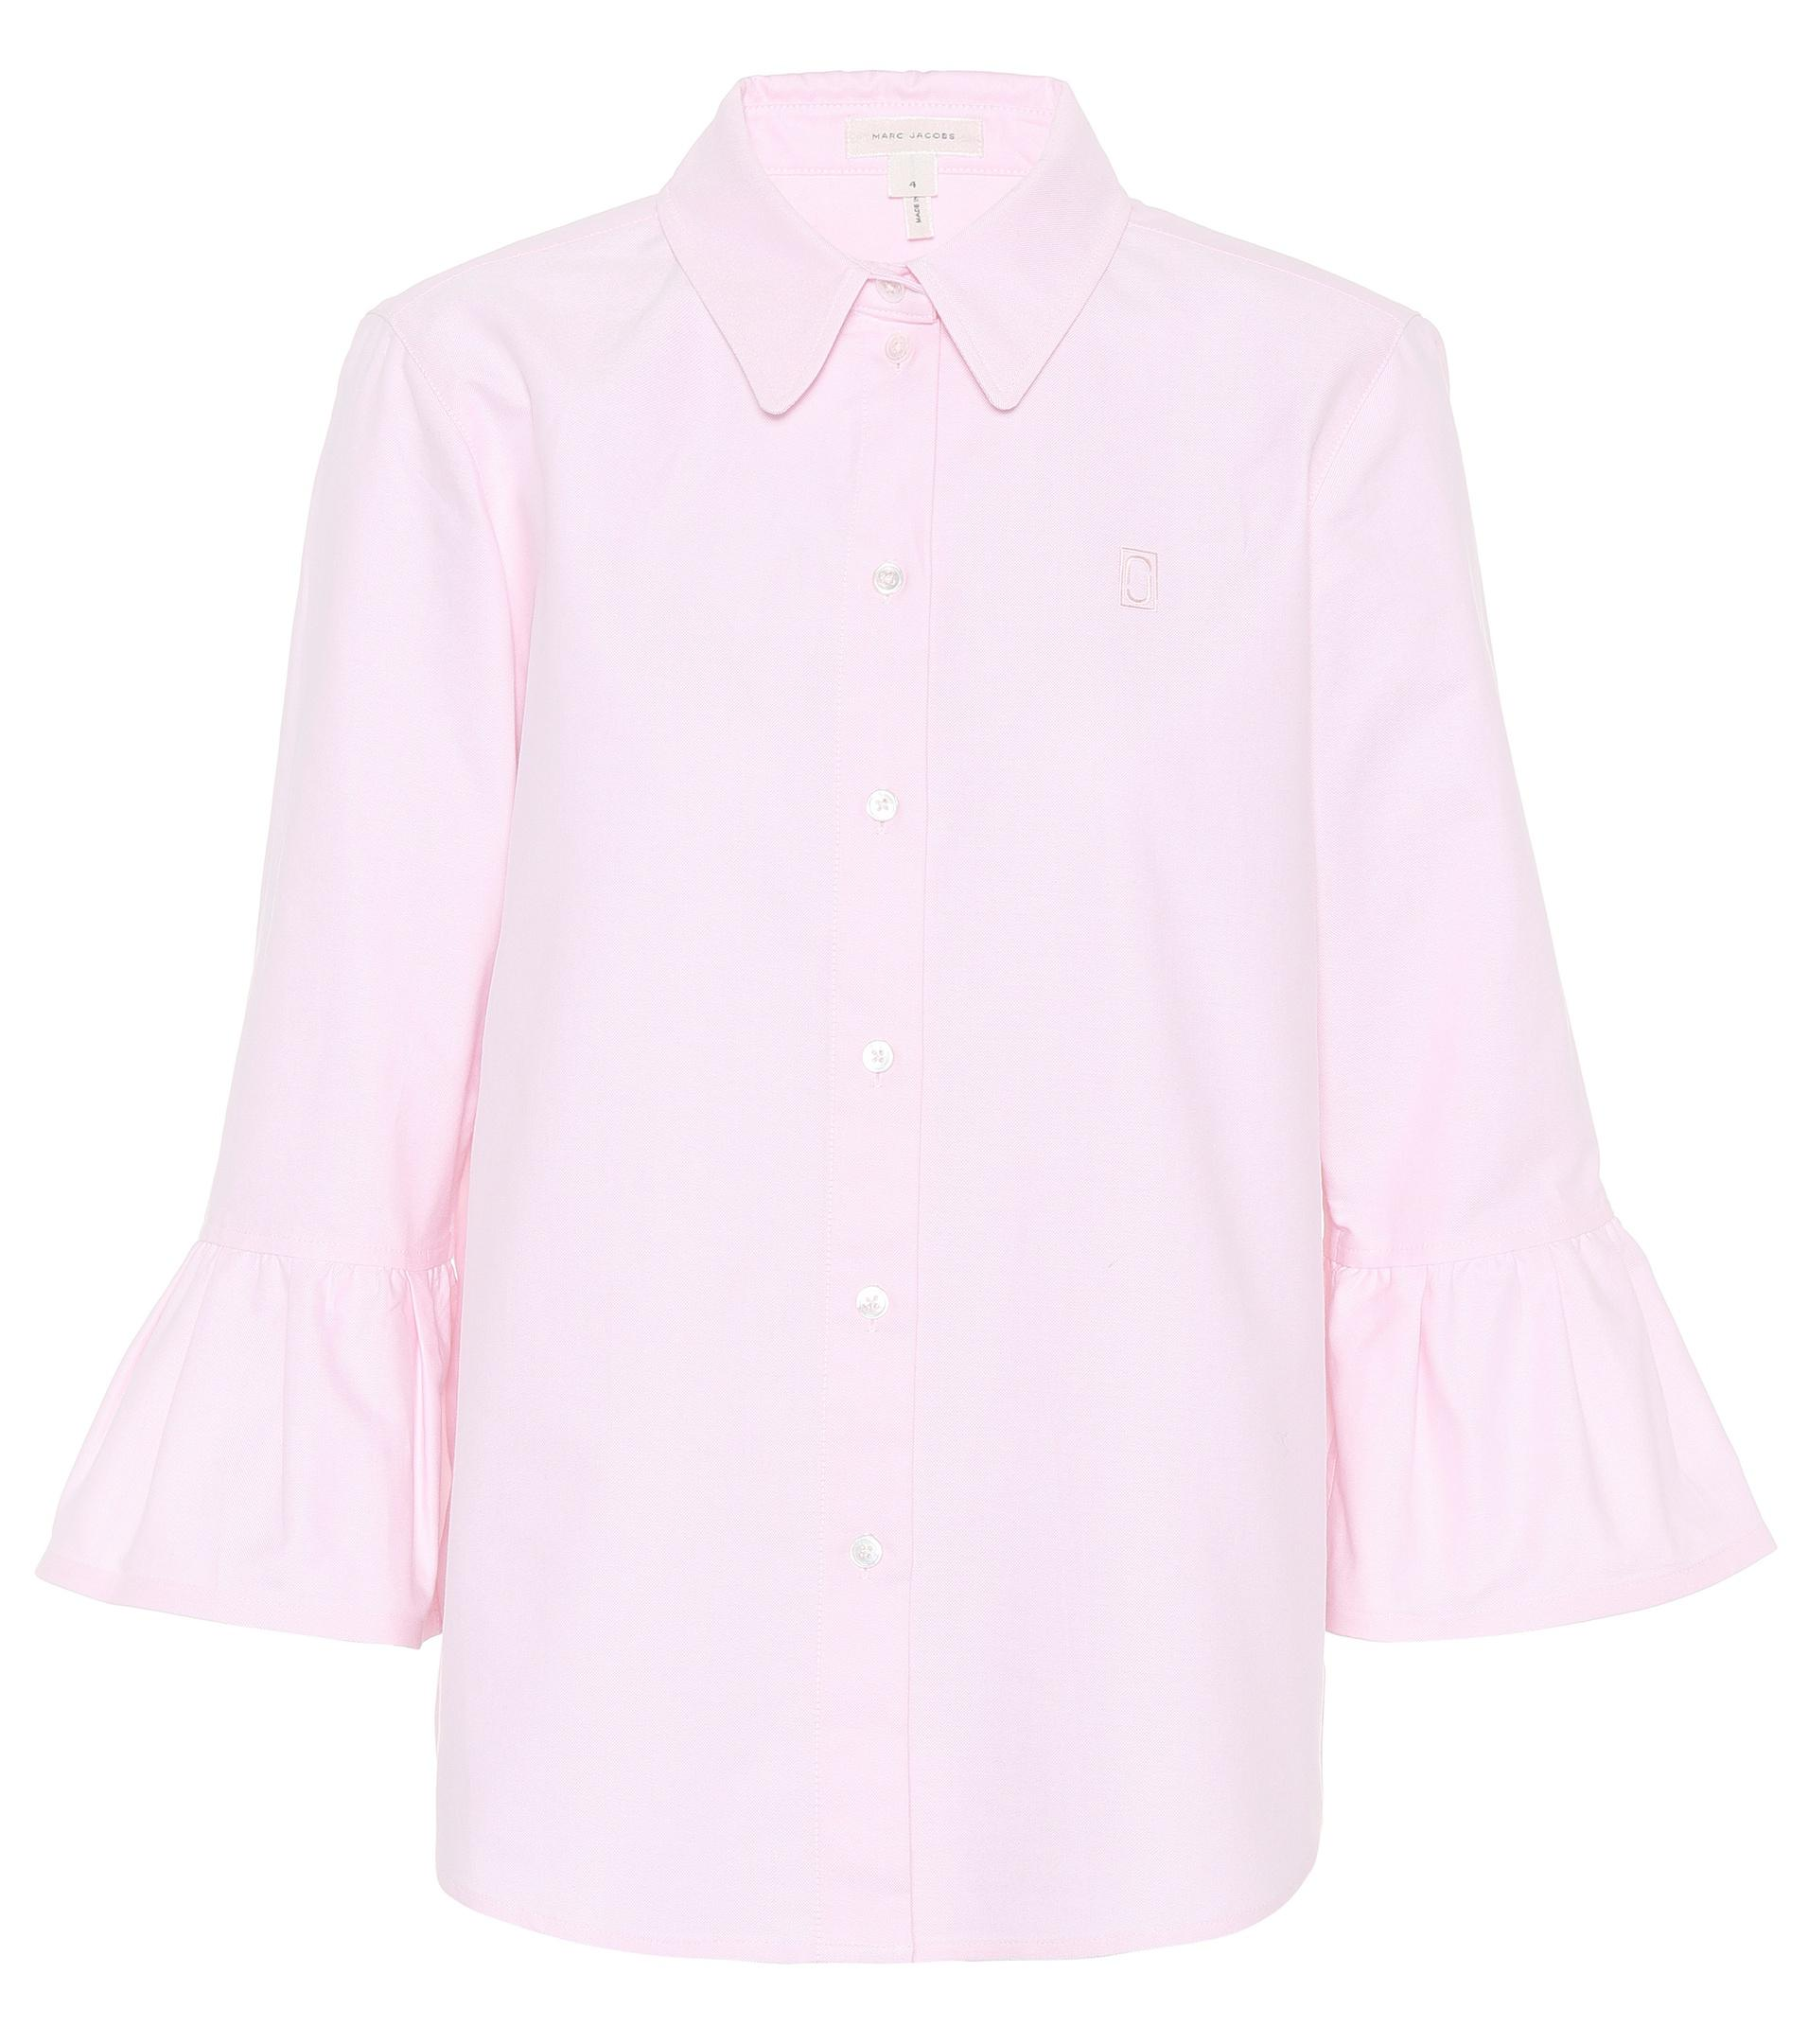 d420ca30741c98 Marc Jacobs - Pink Cotton Shirt - Lyst. View fullscreen